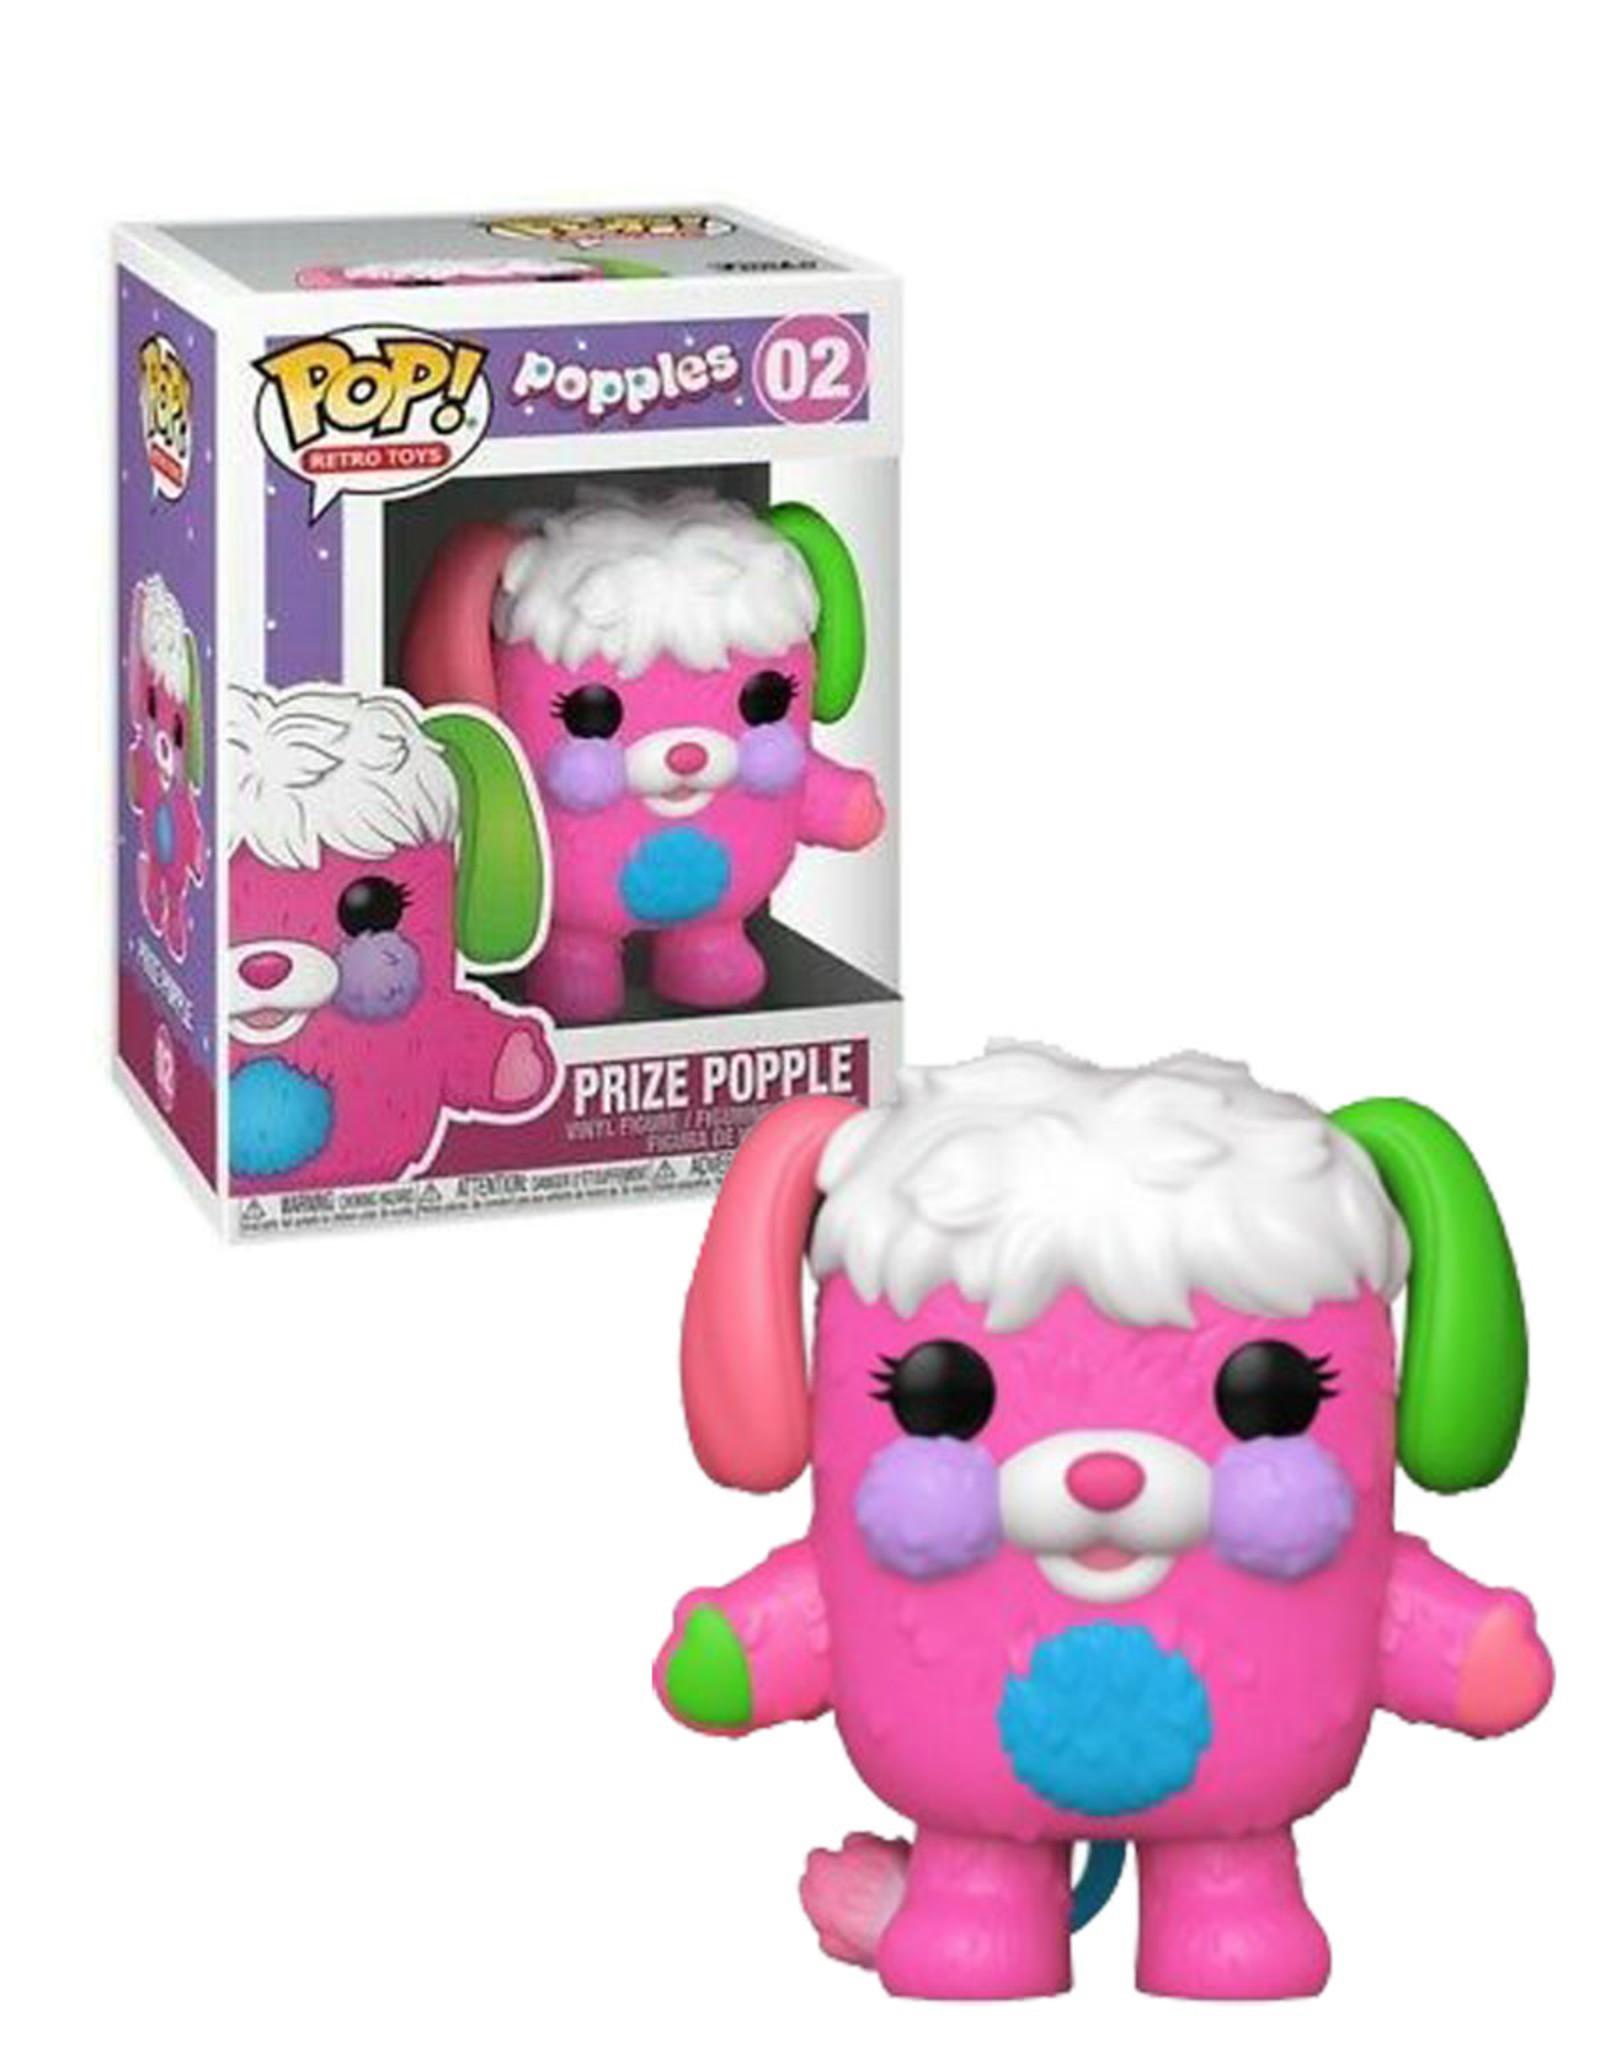 Popples 02 ( Funko Pop ) Prize Popple